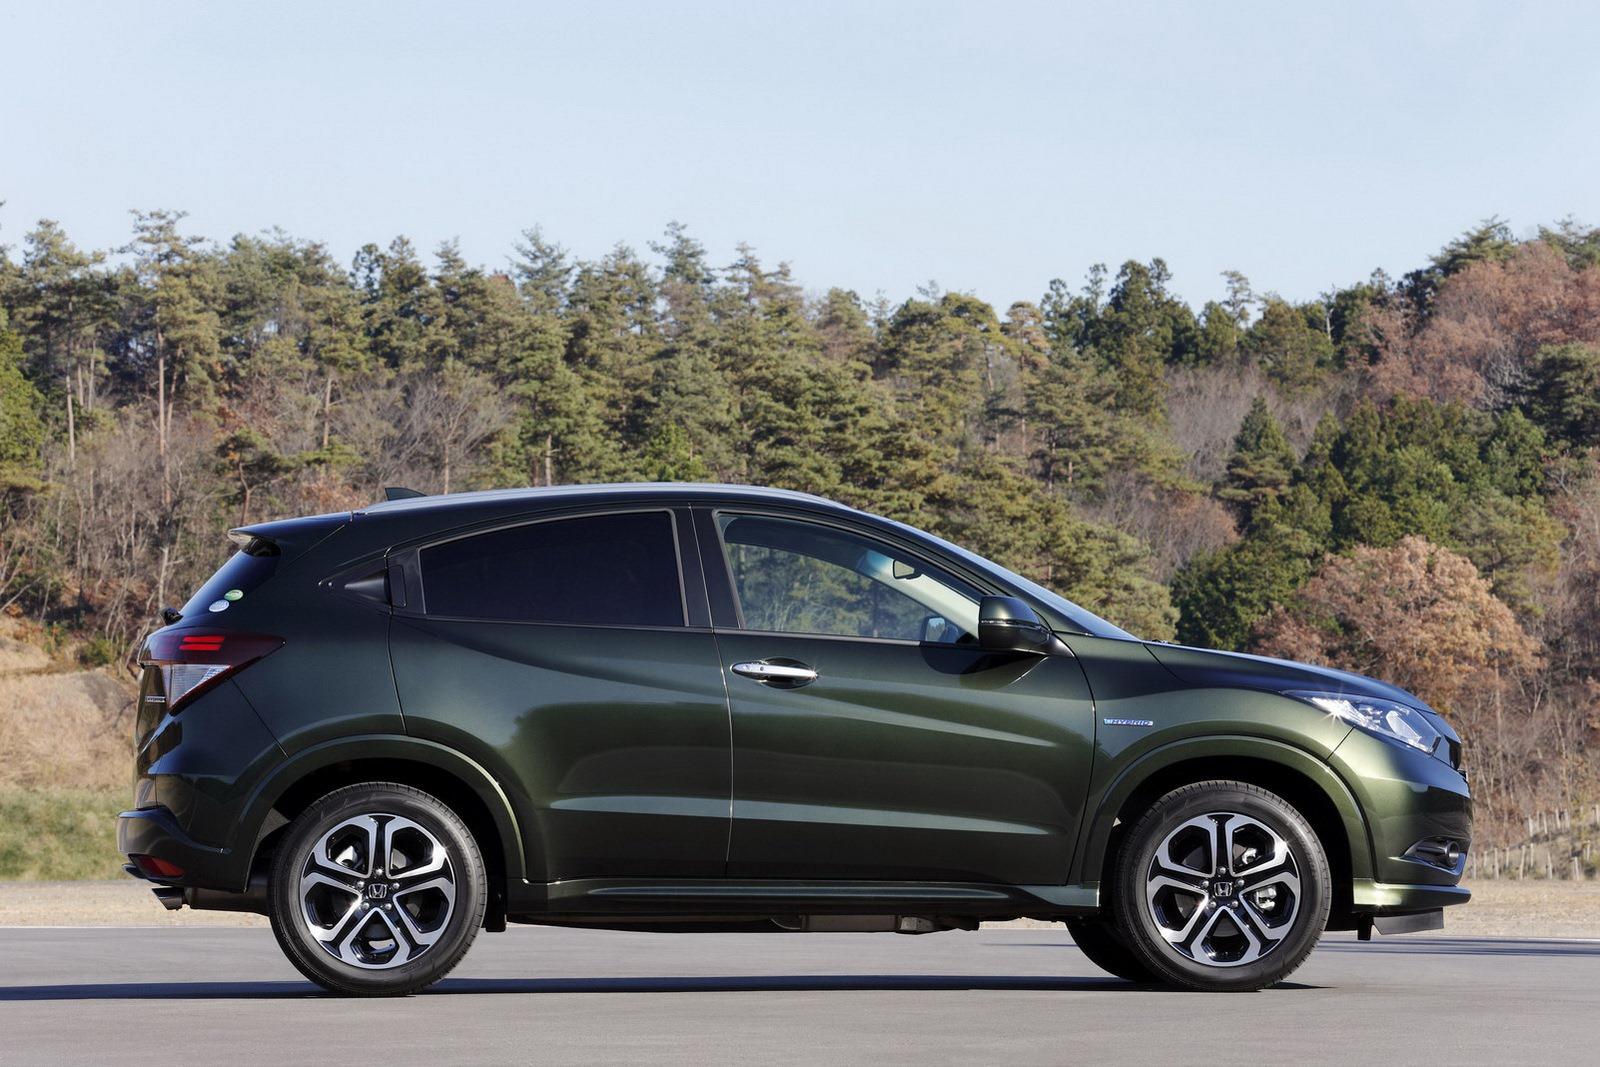 2014 - [Honda] Vezel / HR-V - Page 2 New-Honda-Vezel-38%25255B2%25255D